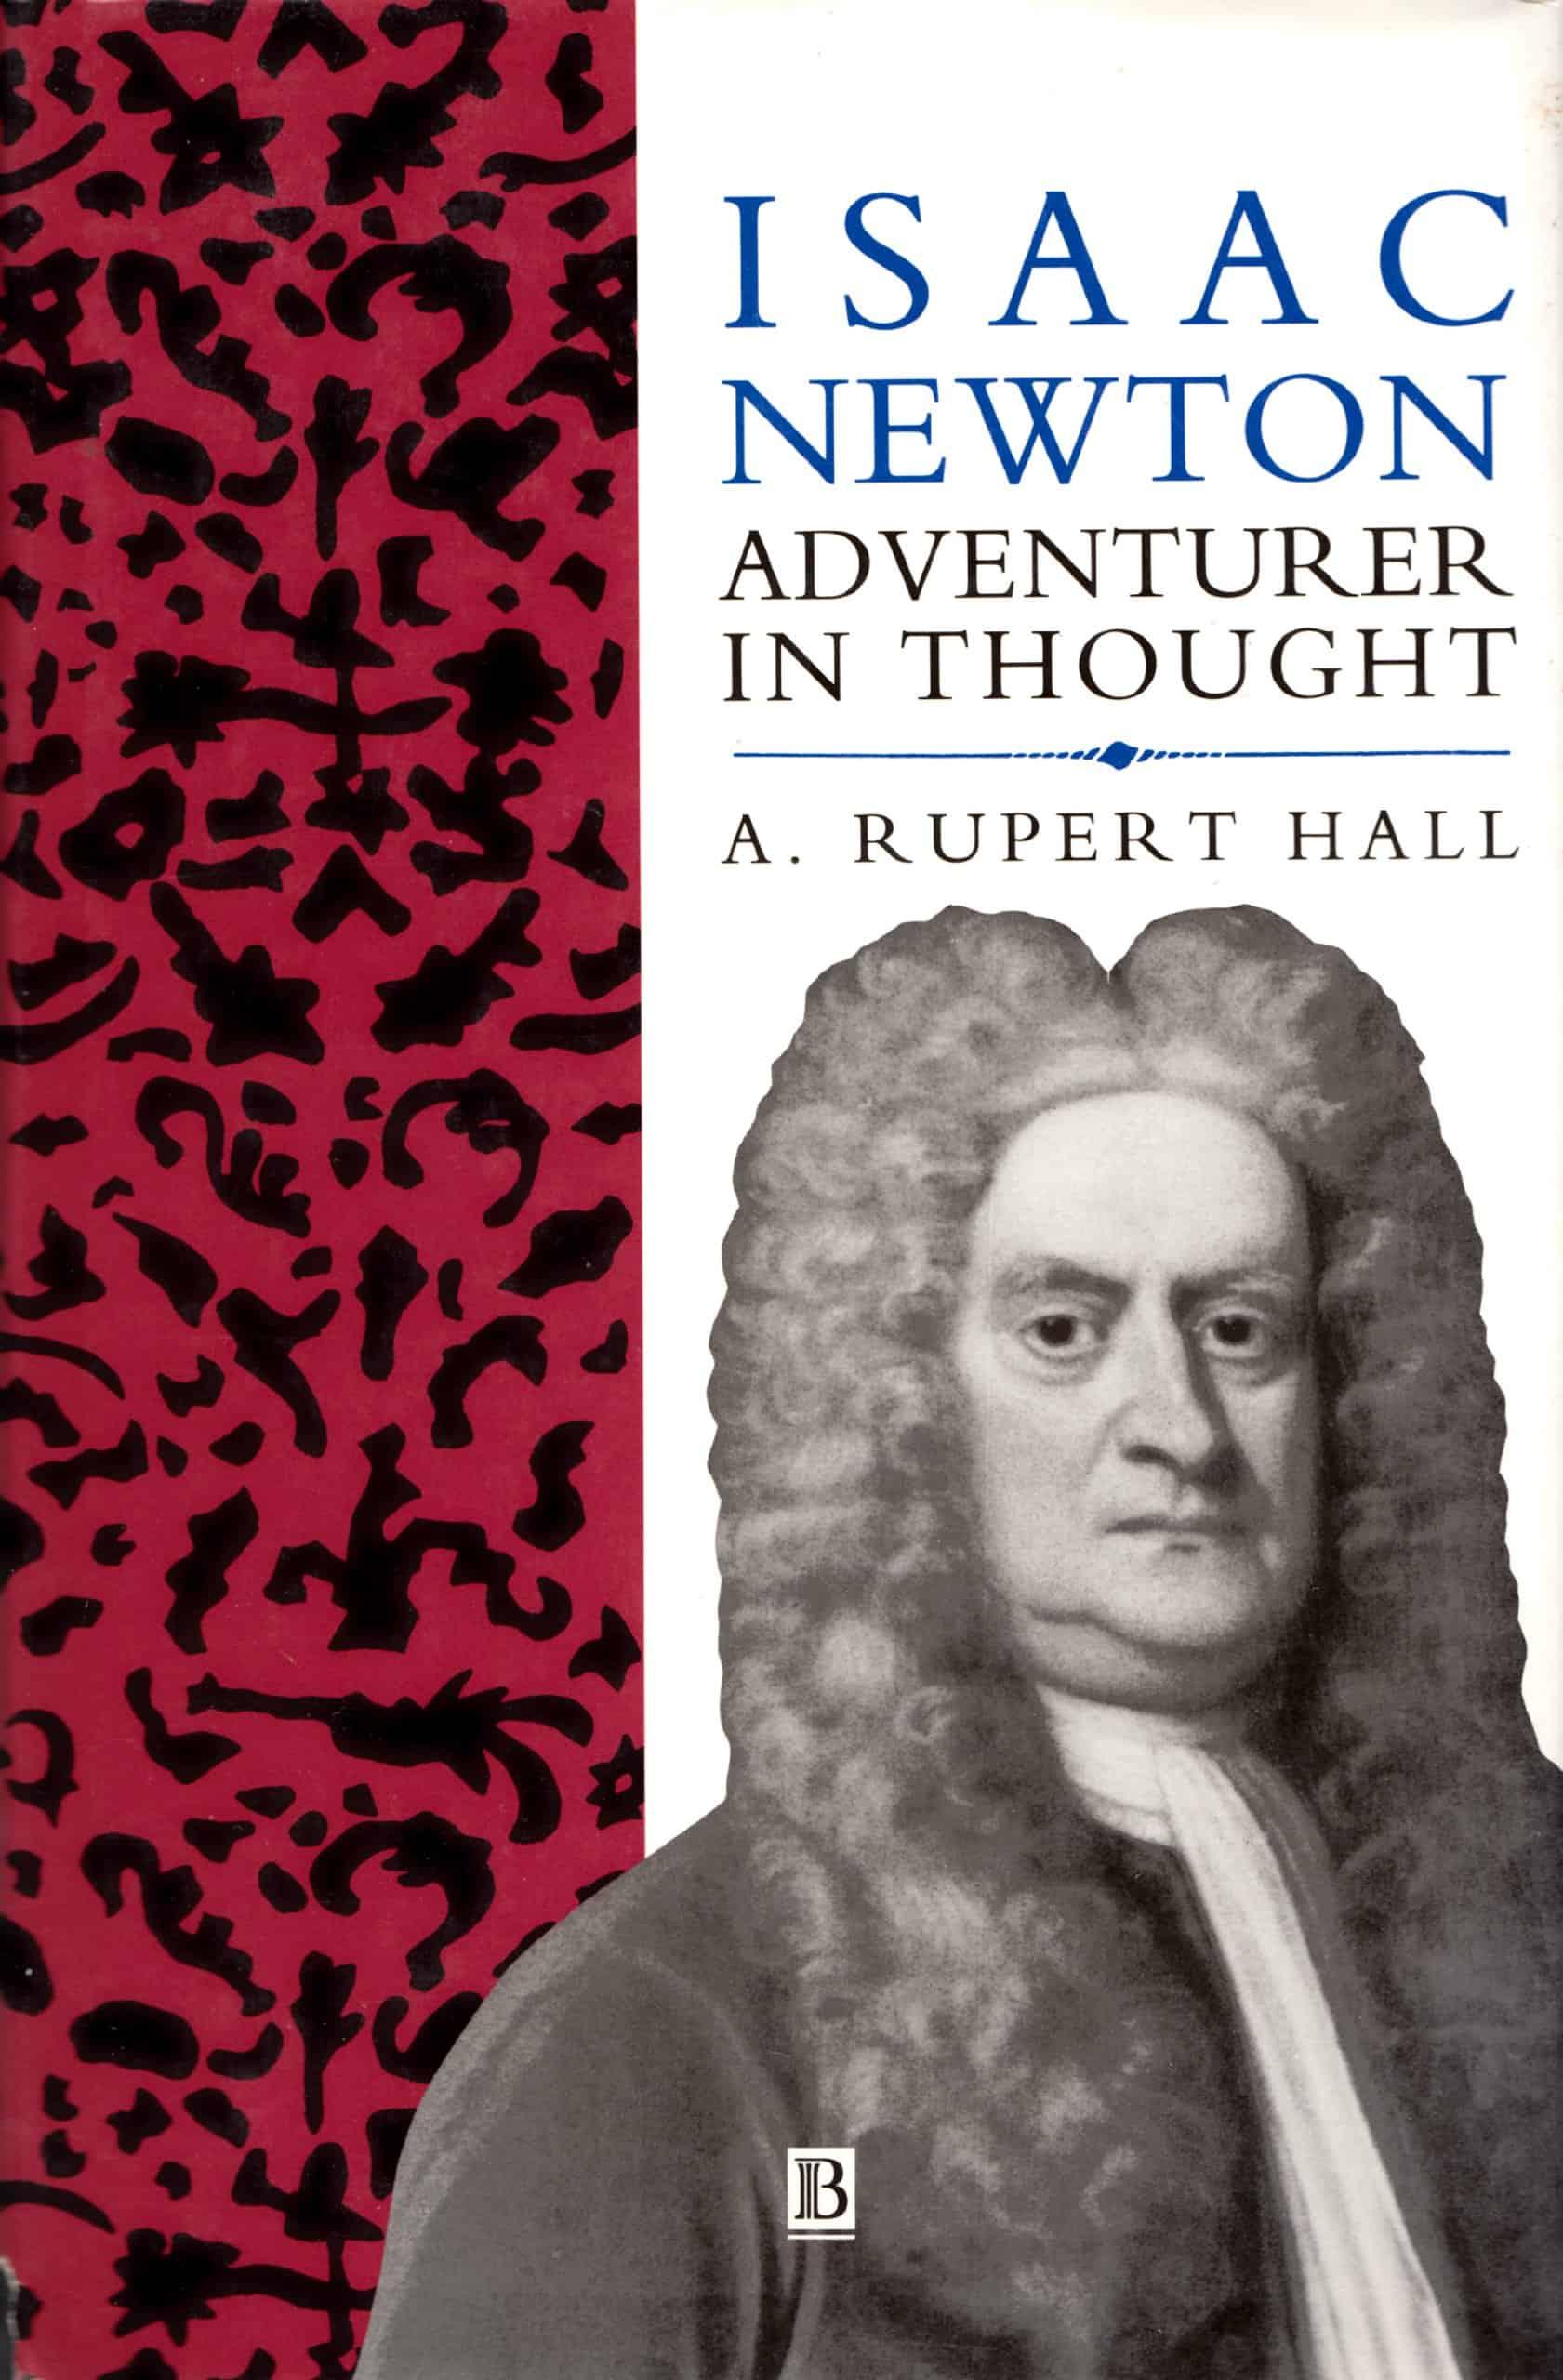 Isaac Newton Adventurer In Thought - Isaac Newton: Adventurer In Thought